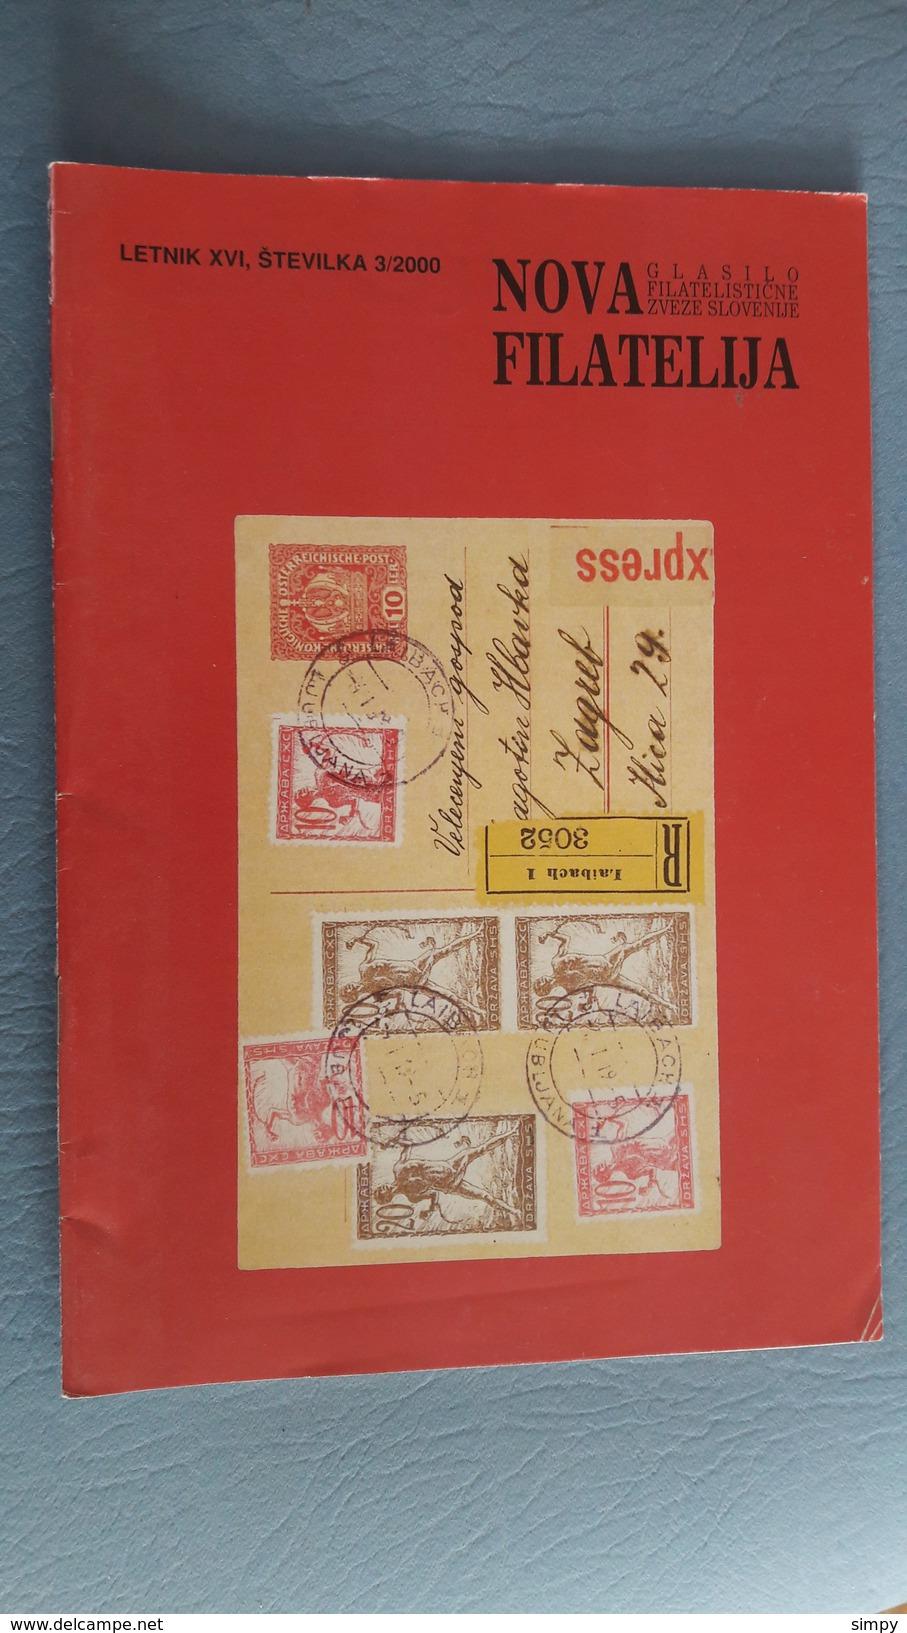 Slovenia - Philatelic Bulletin Nova Filatelija 3/2000 - Zonder Classificatie